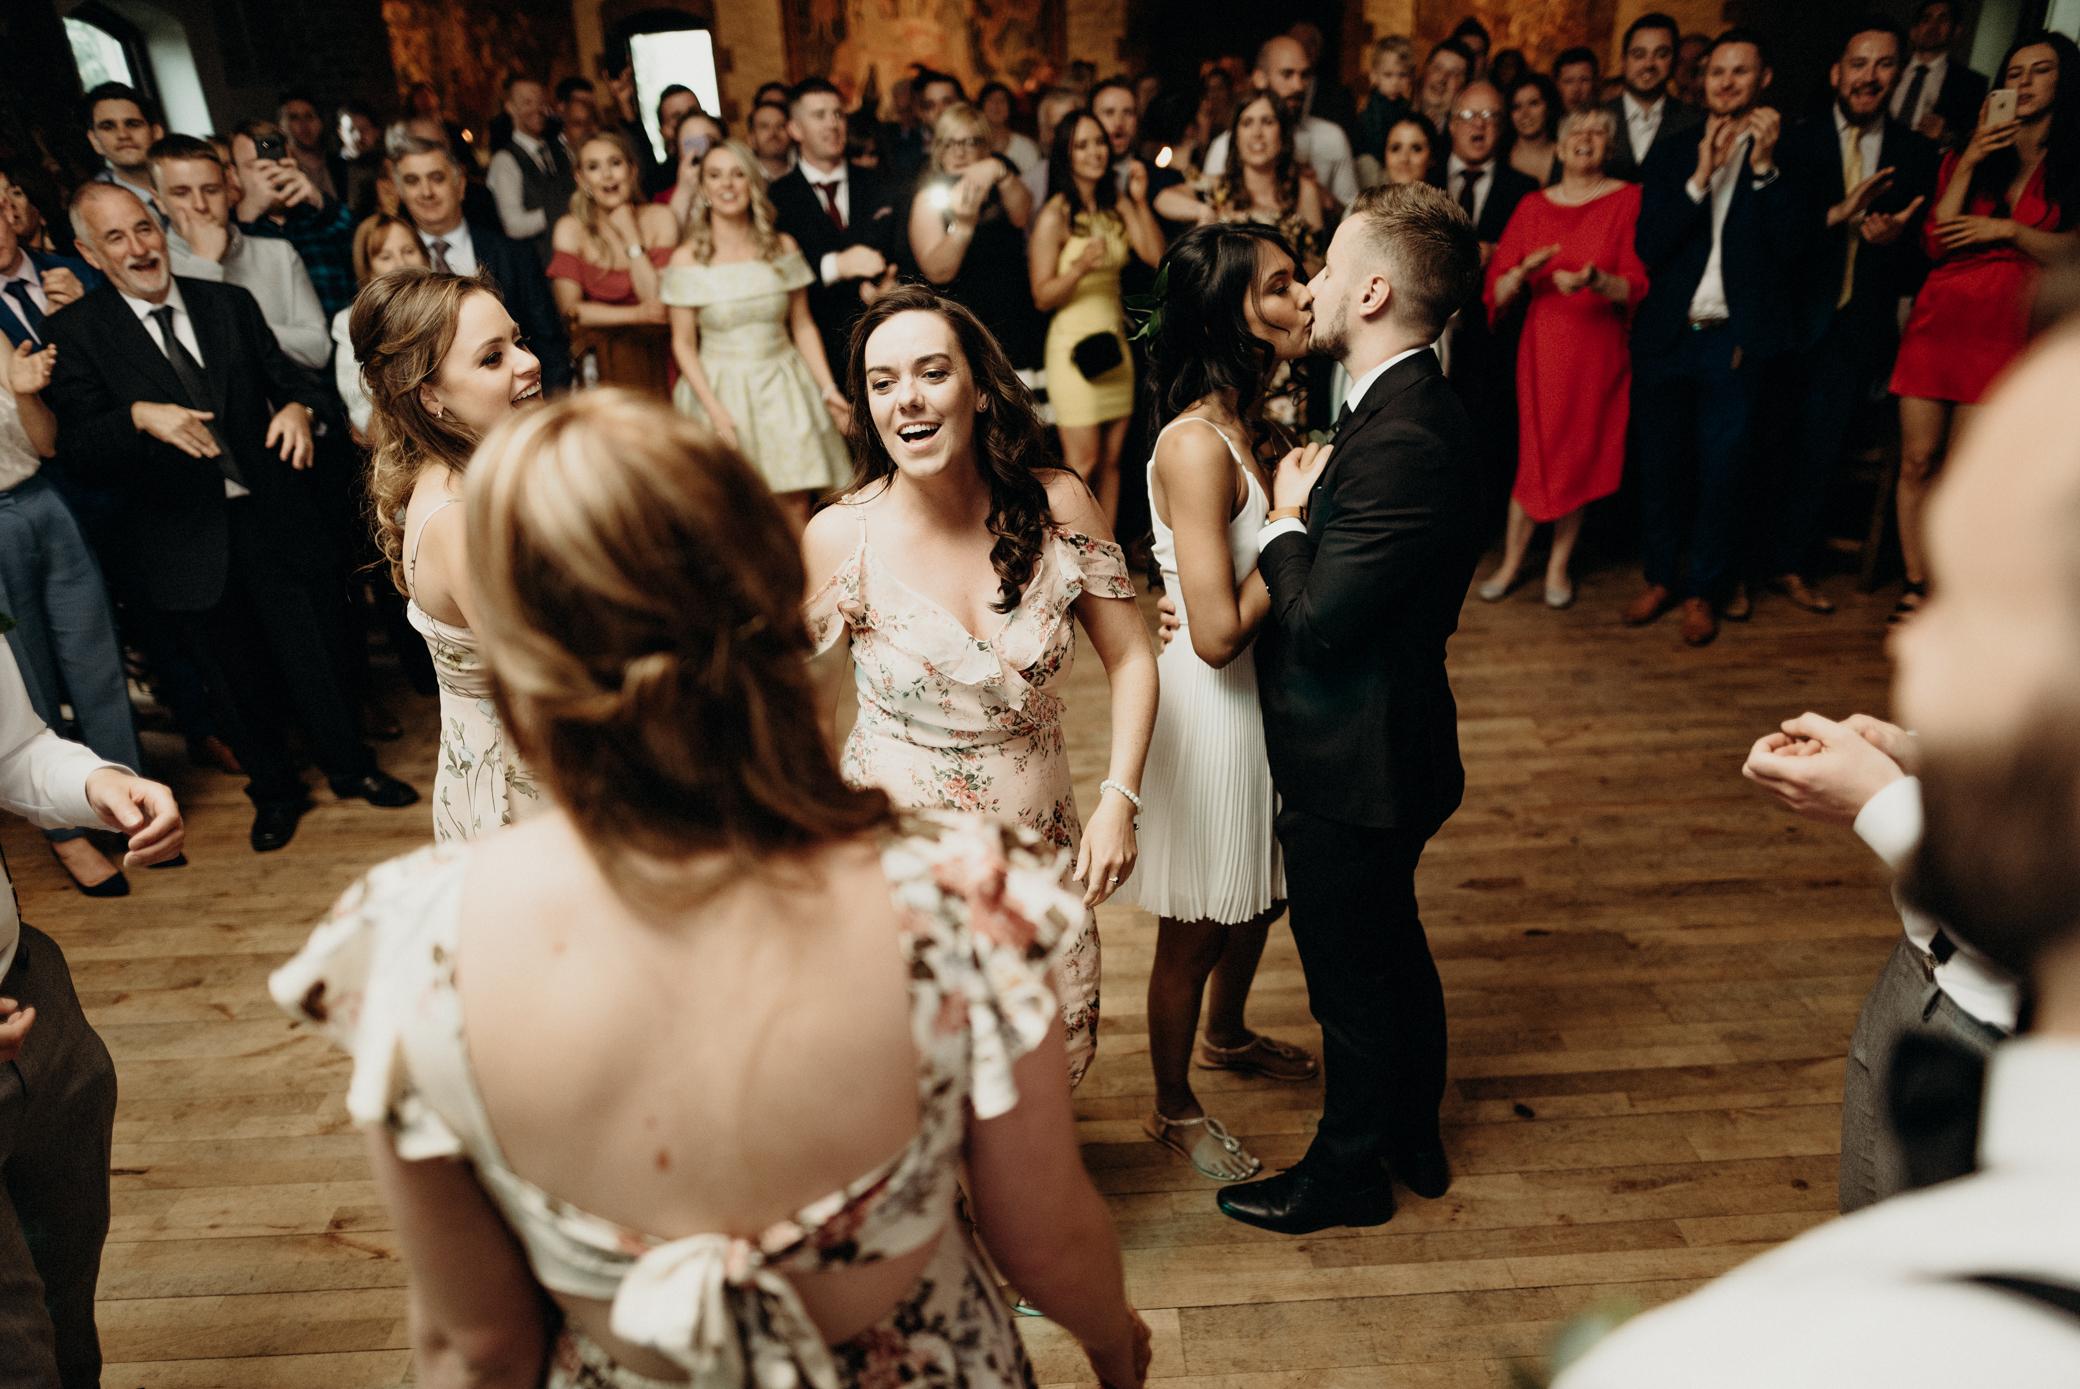 Alan&Naz- Barberstown Castle Wedding - Wedding photographer Ireland-210.jpg